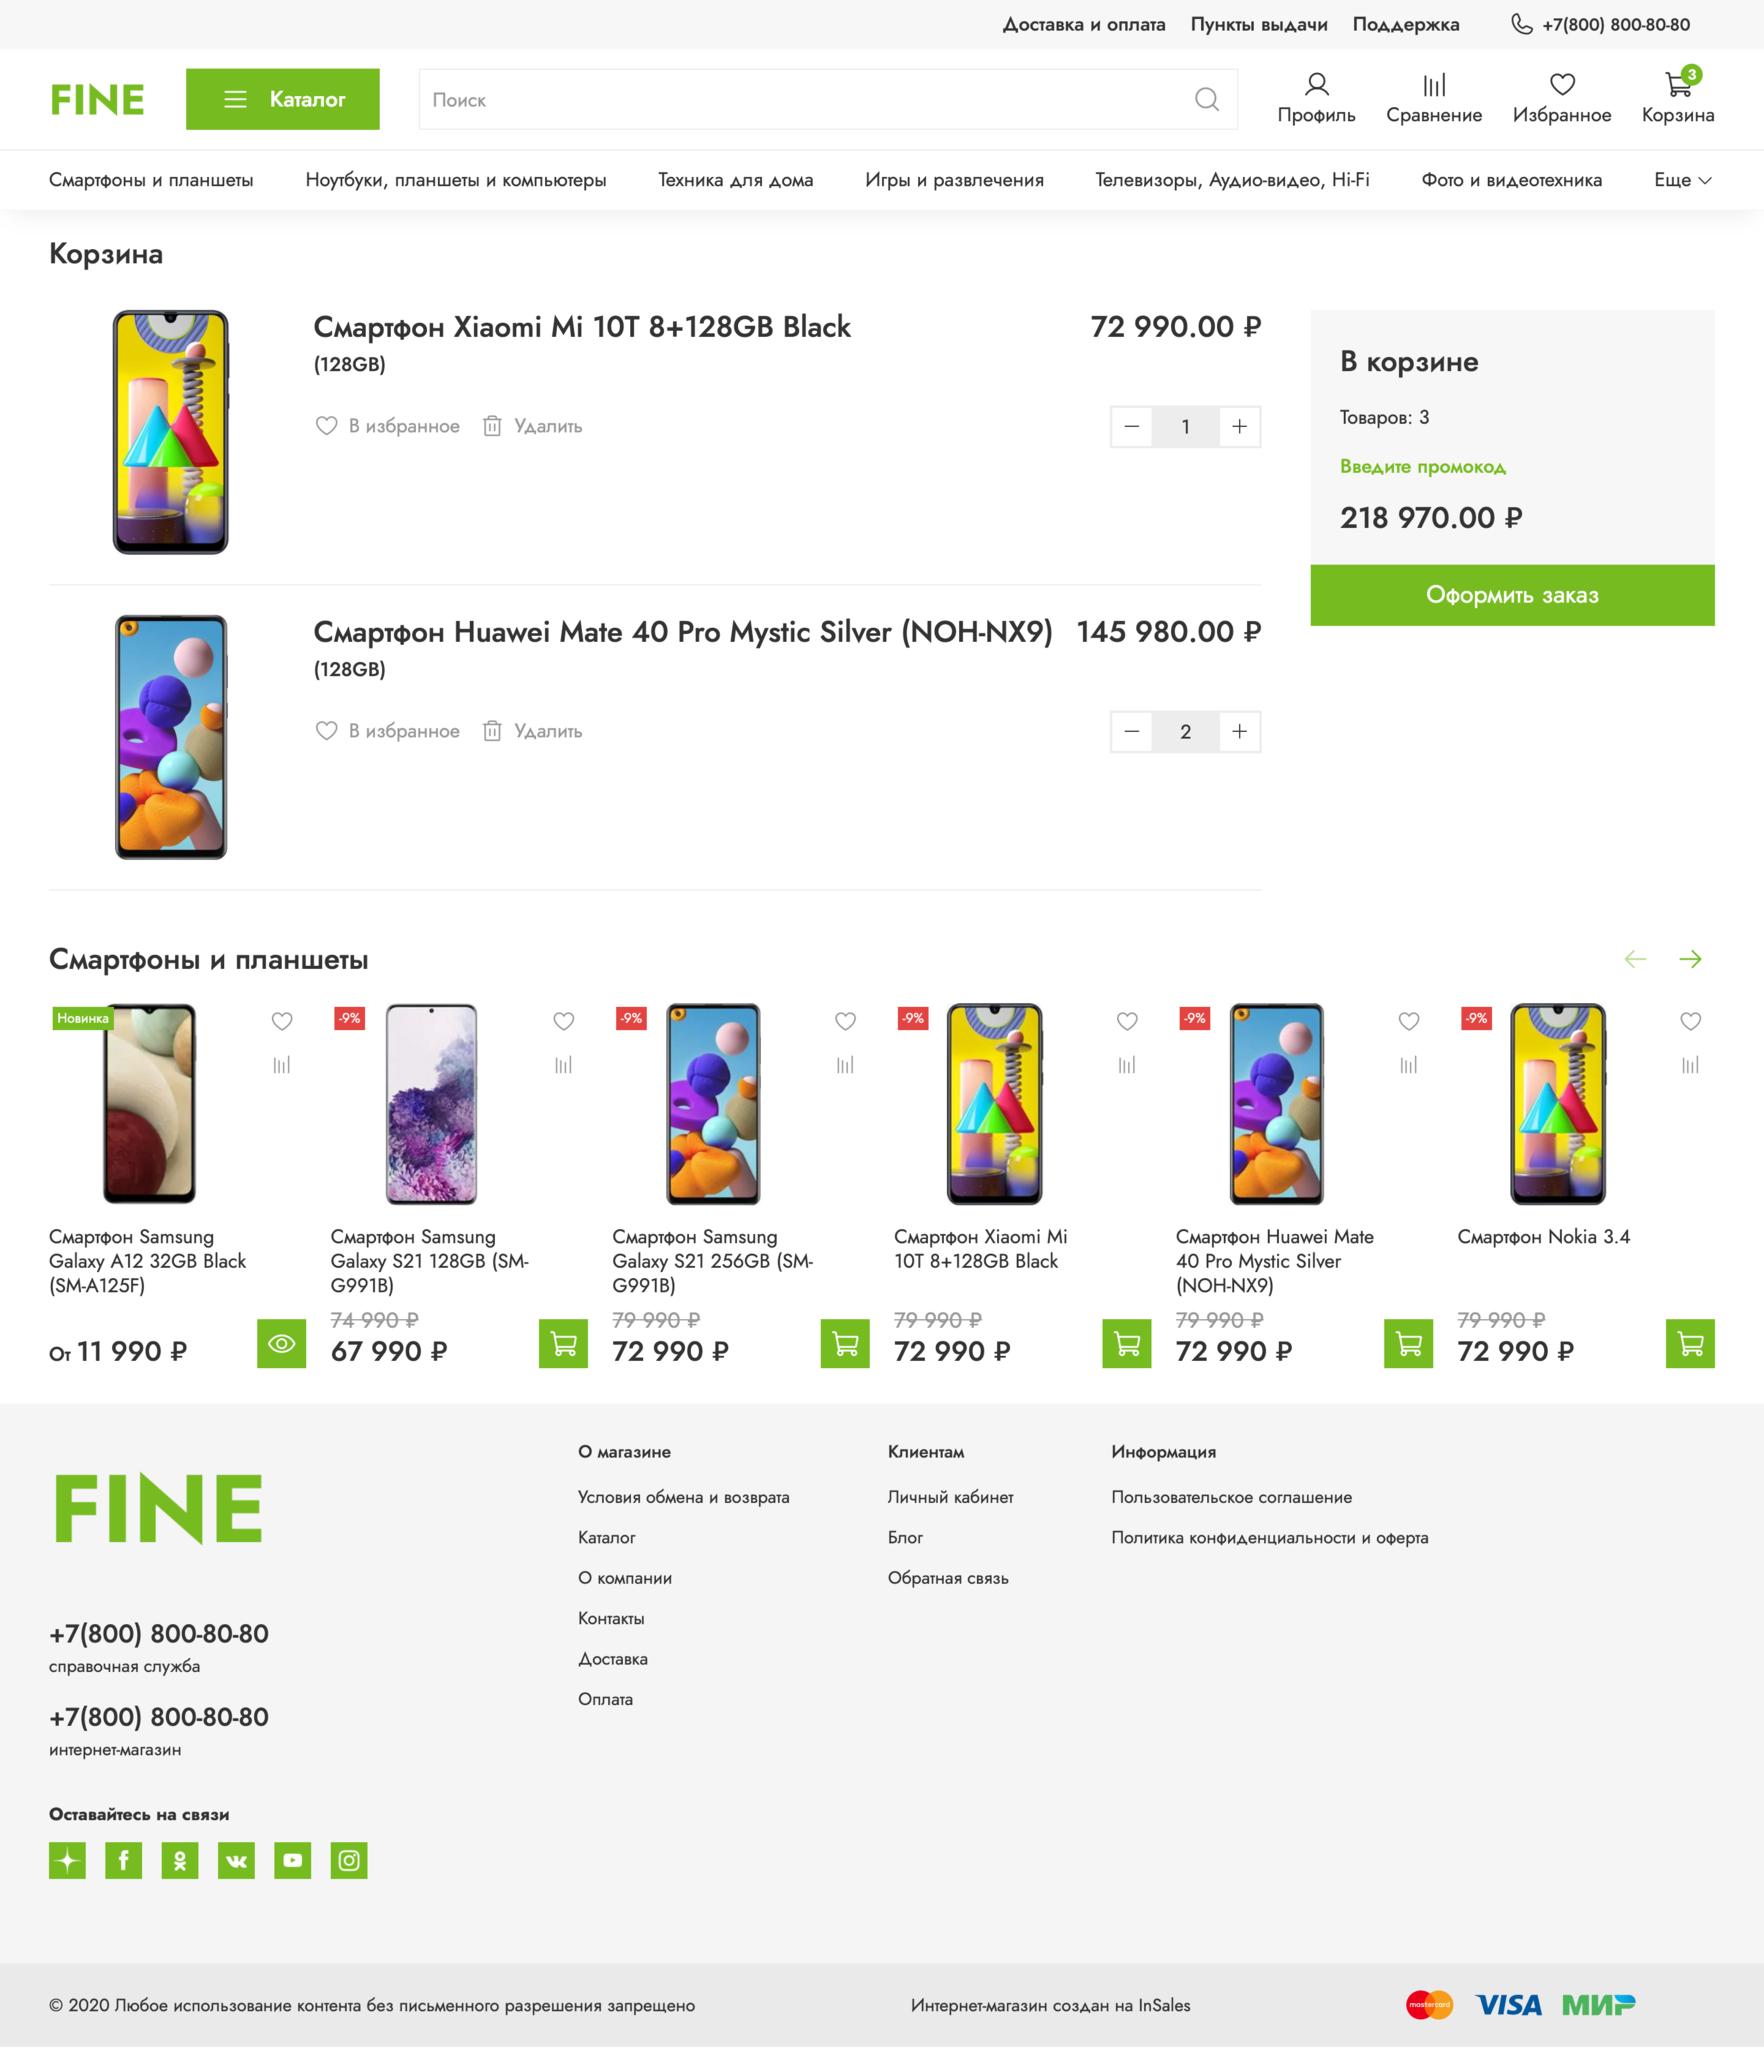 Шаблон интернет магазина - Fine